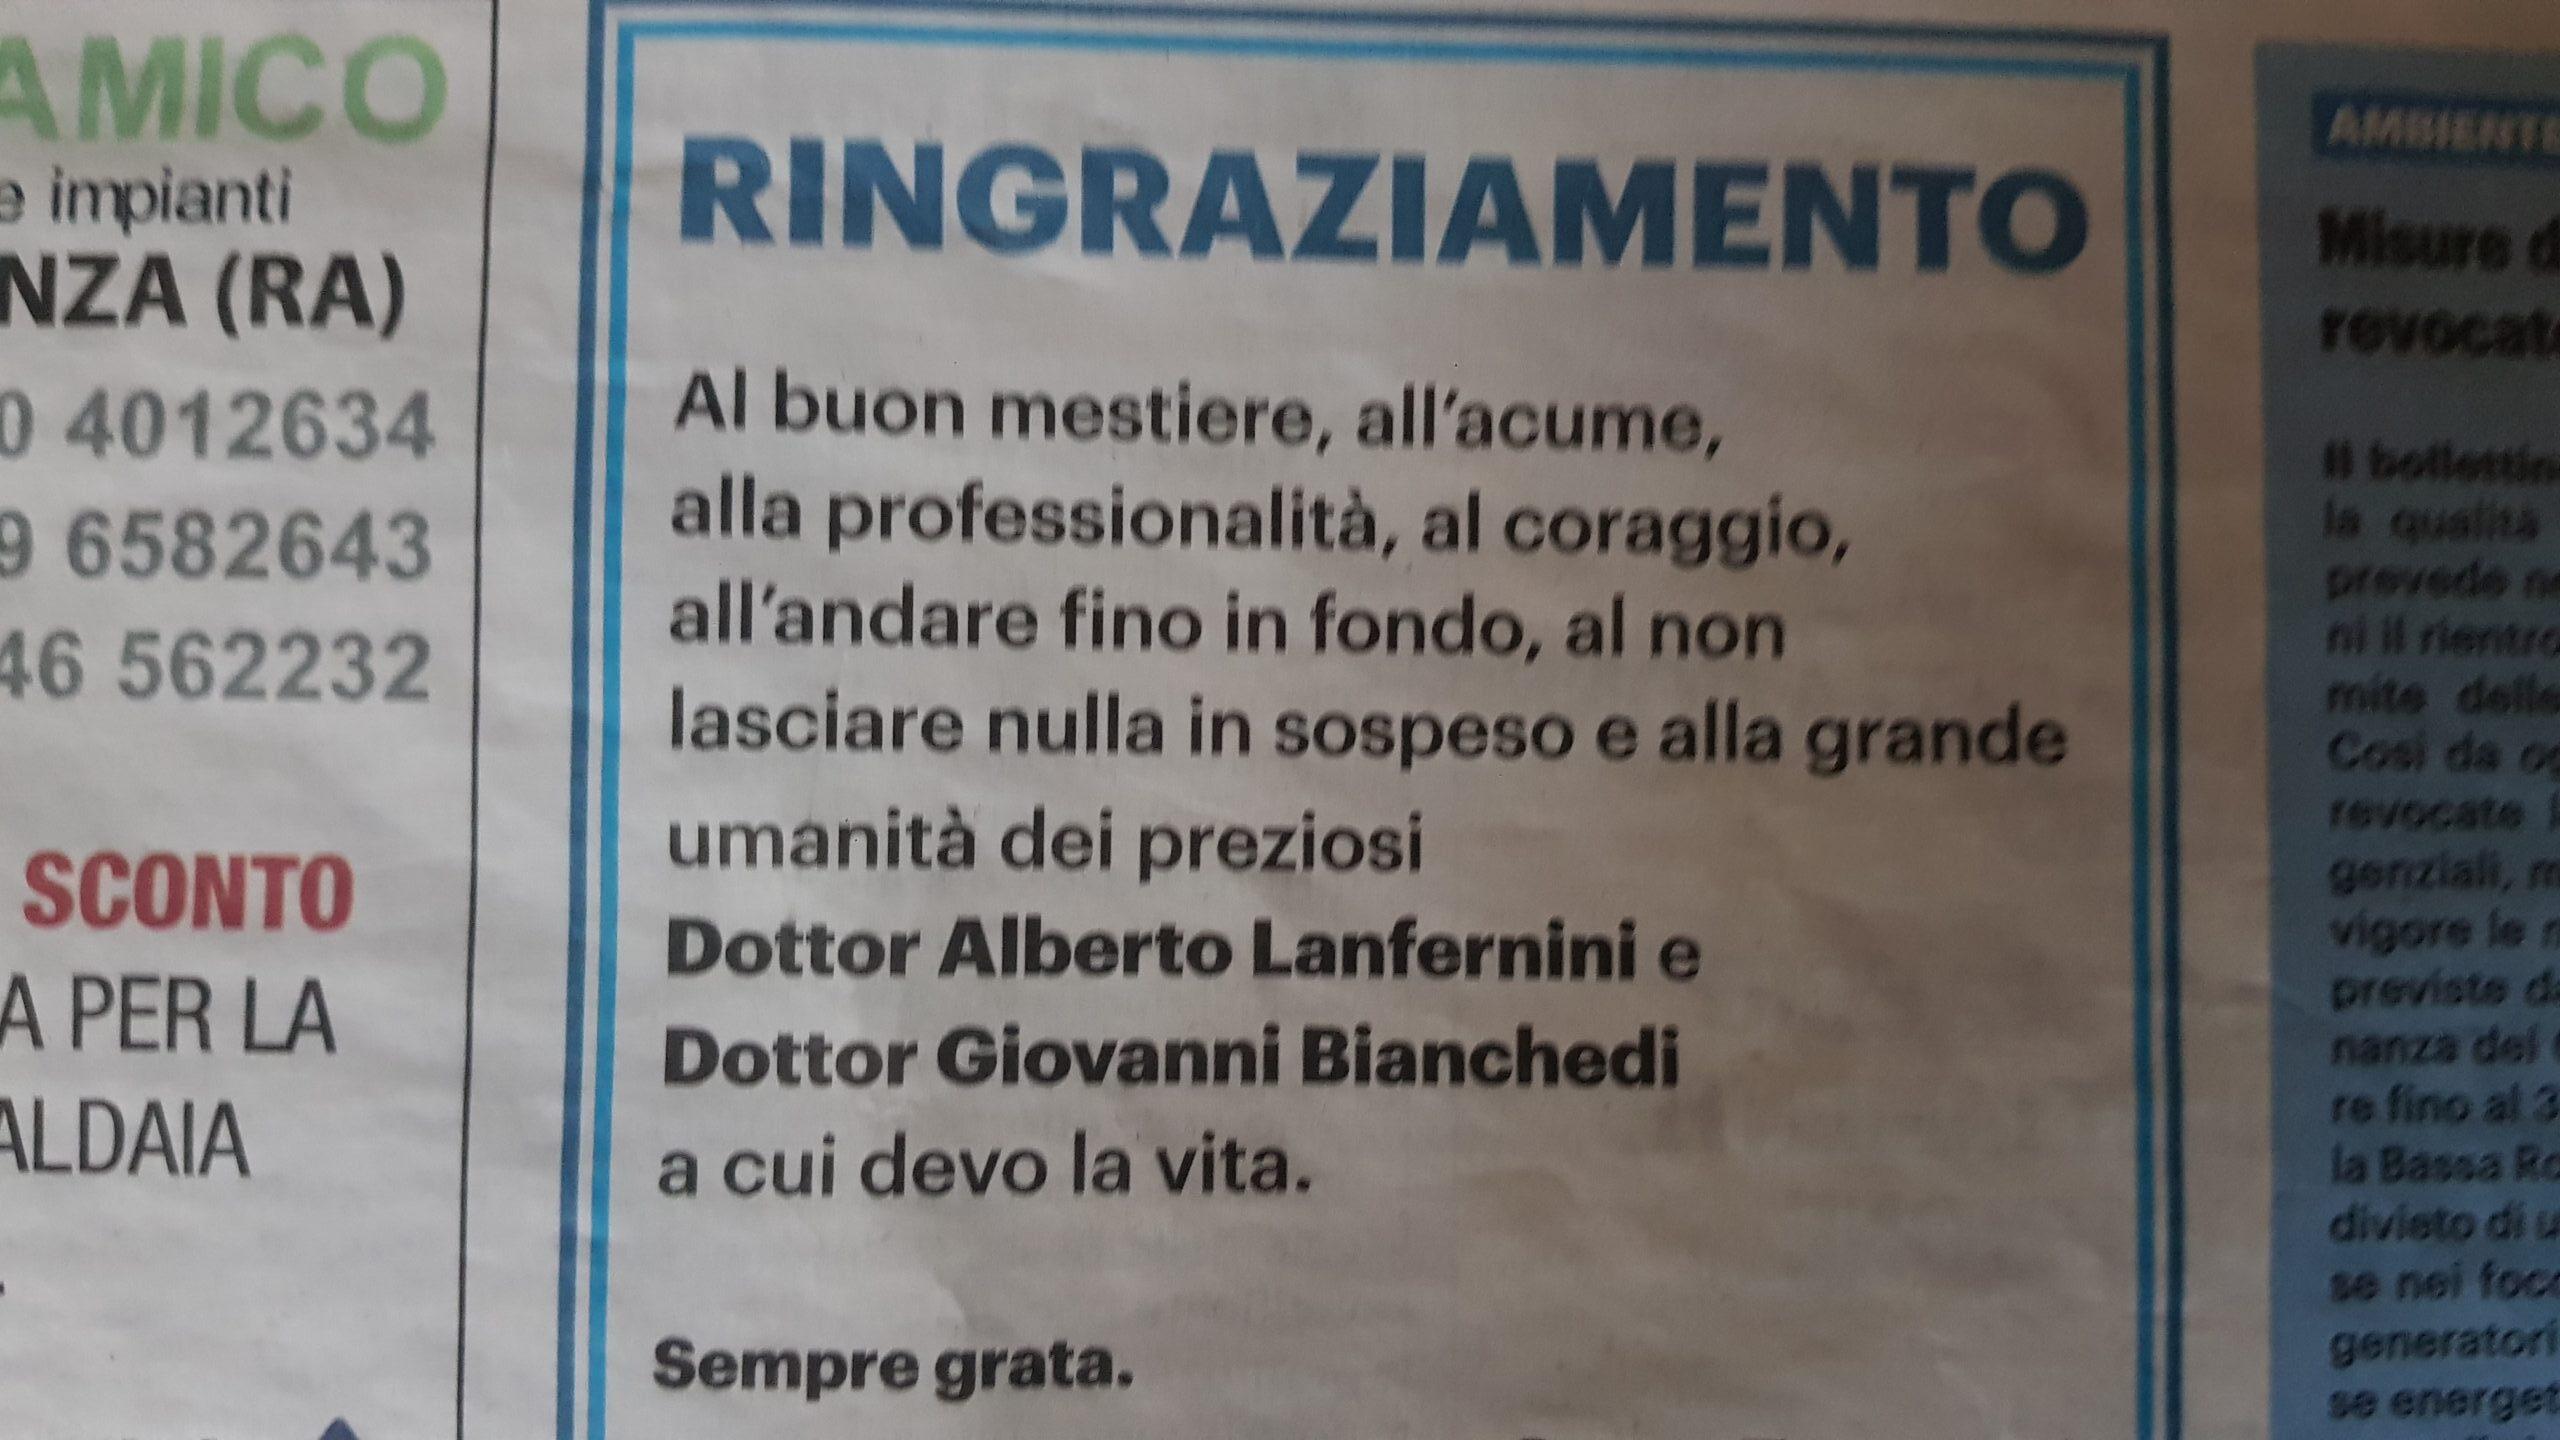 ringraziamento Carlino Faenza Dot. Lanfernini Oculista Faenza Dot. Bianchedi